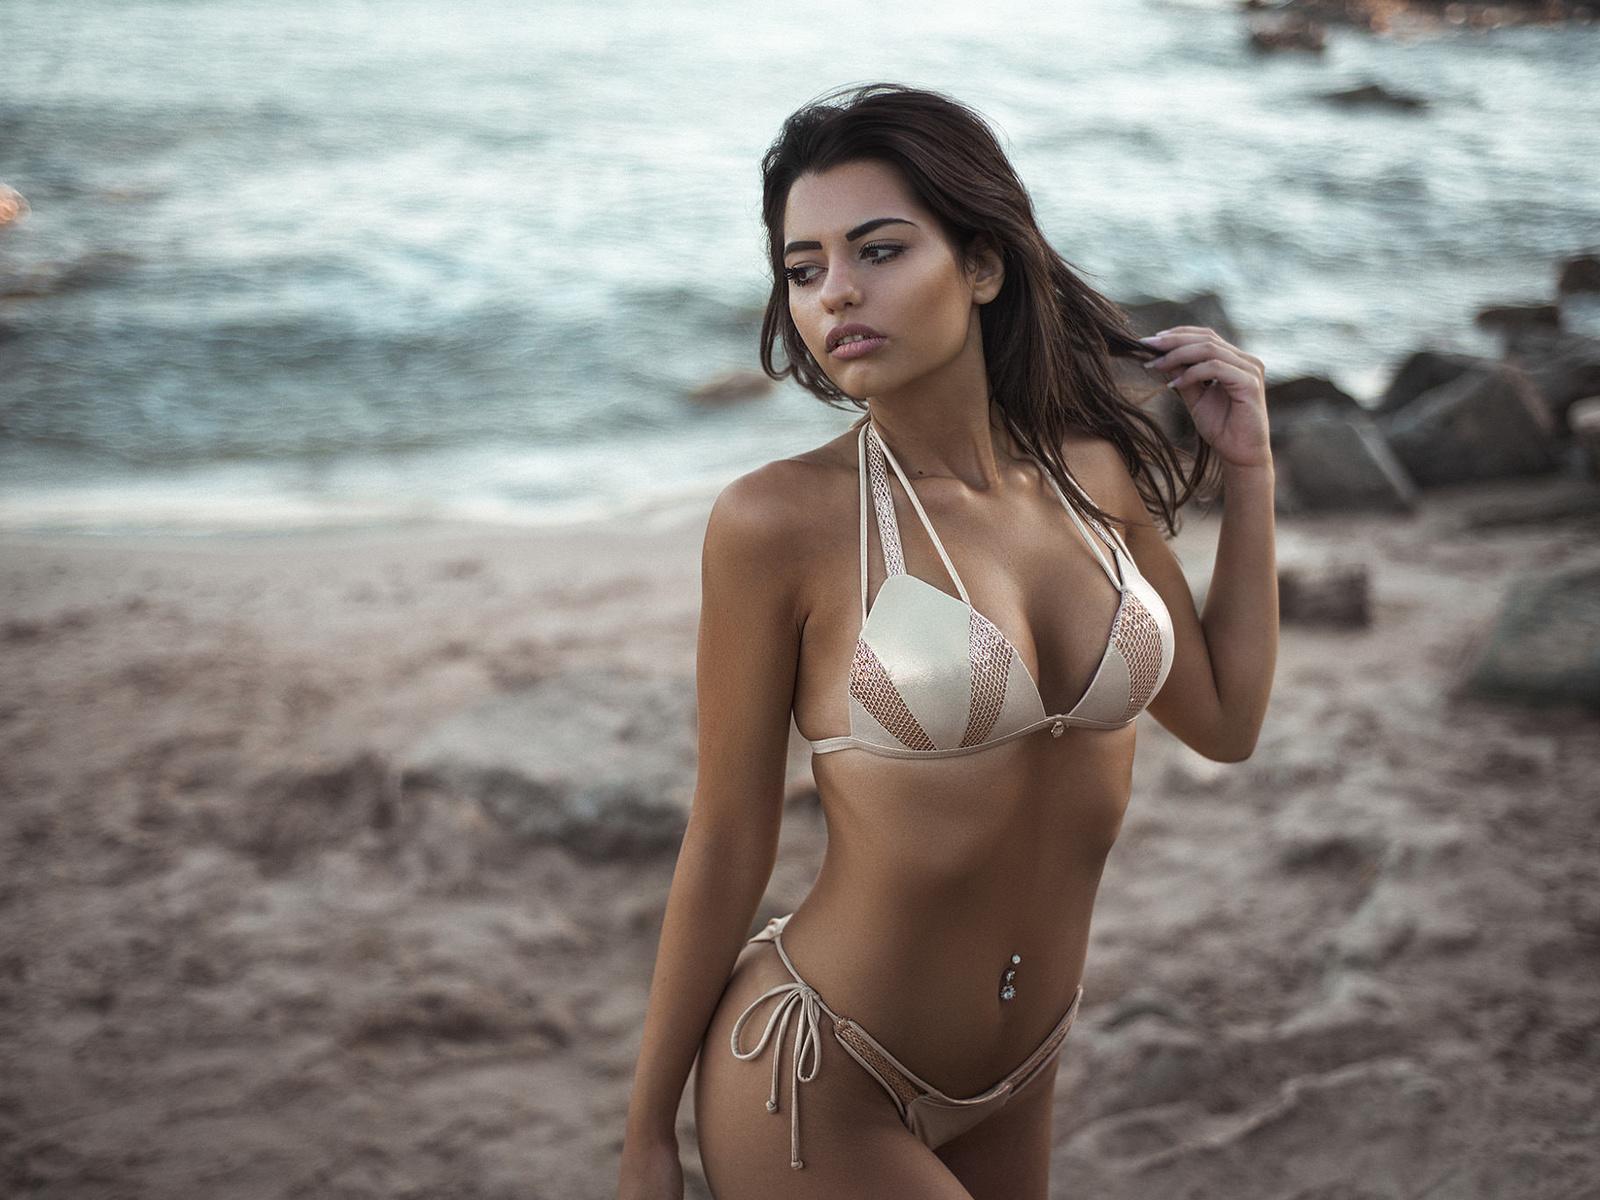 women, brunette, sea, belly, bikini, sand, pierced navel, looking away, women outdoors, ribs, marianna bafiti, dimitris konstantinidis